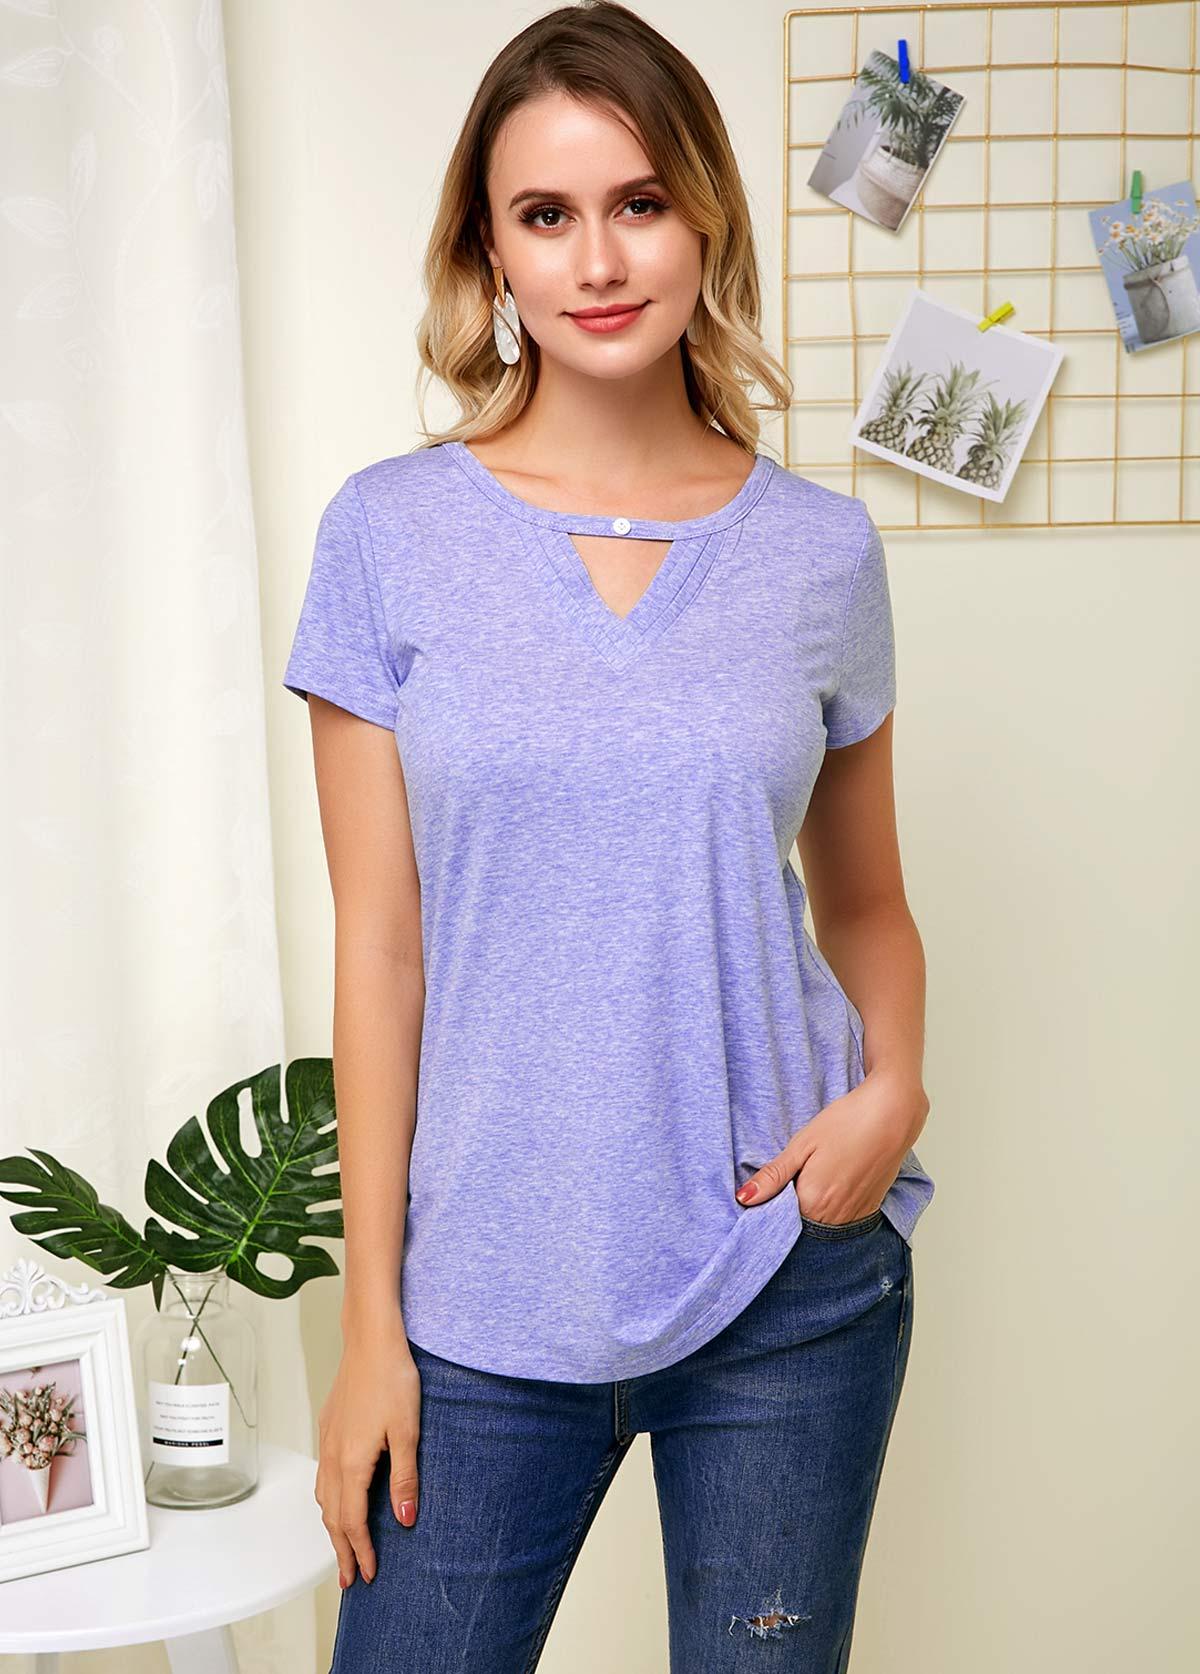 Hollow Neck Short Sleeve Purplish Blue Soft T Shirt